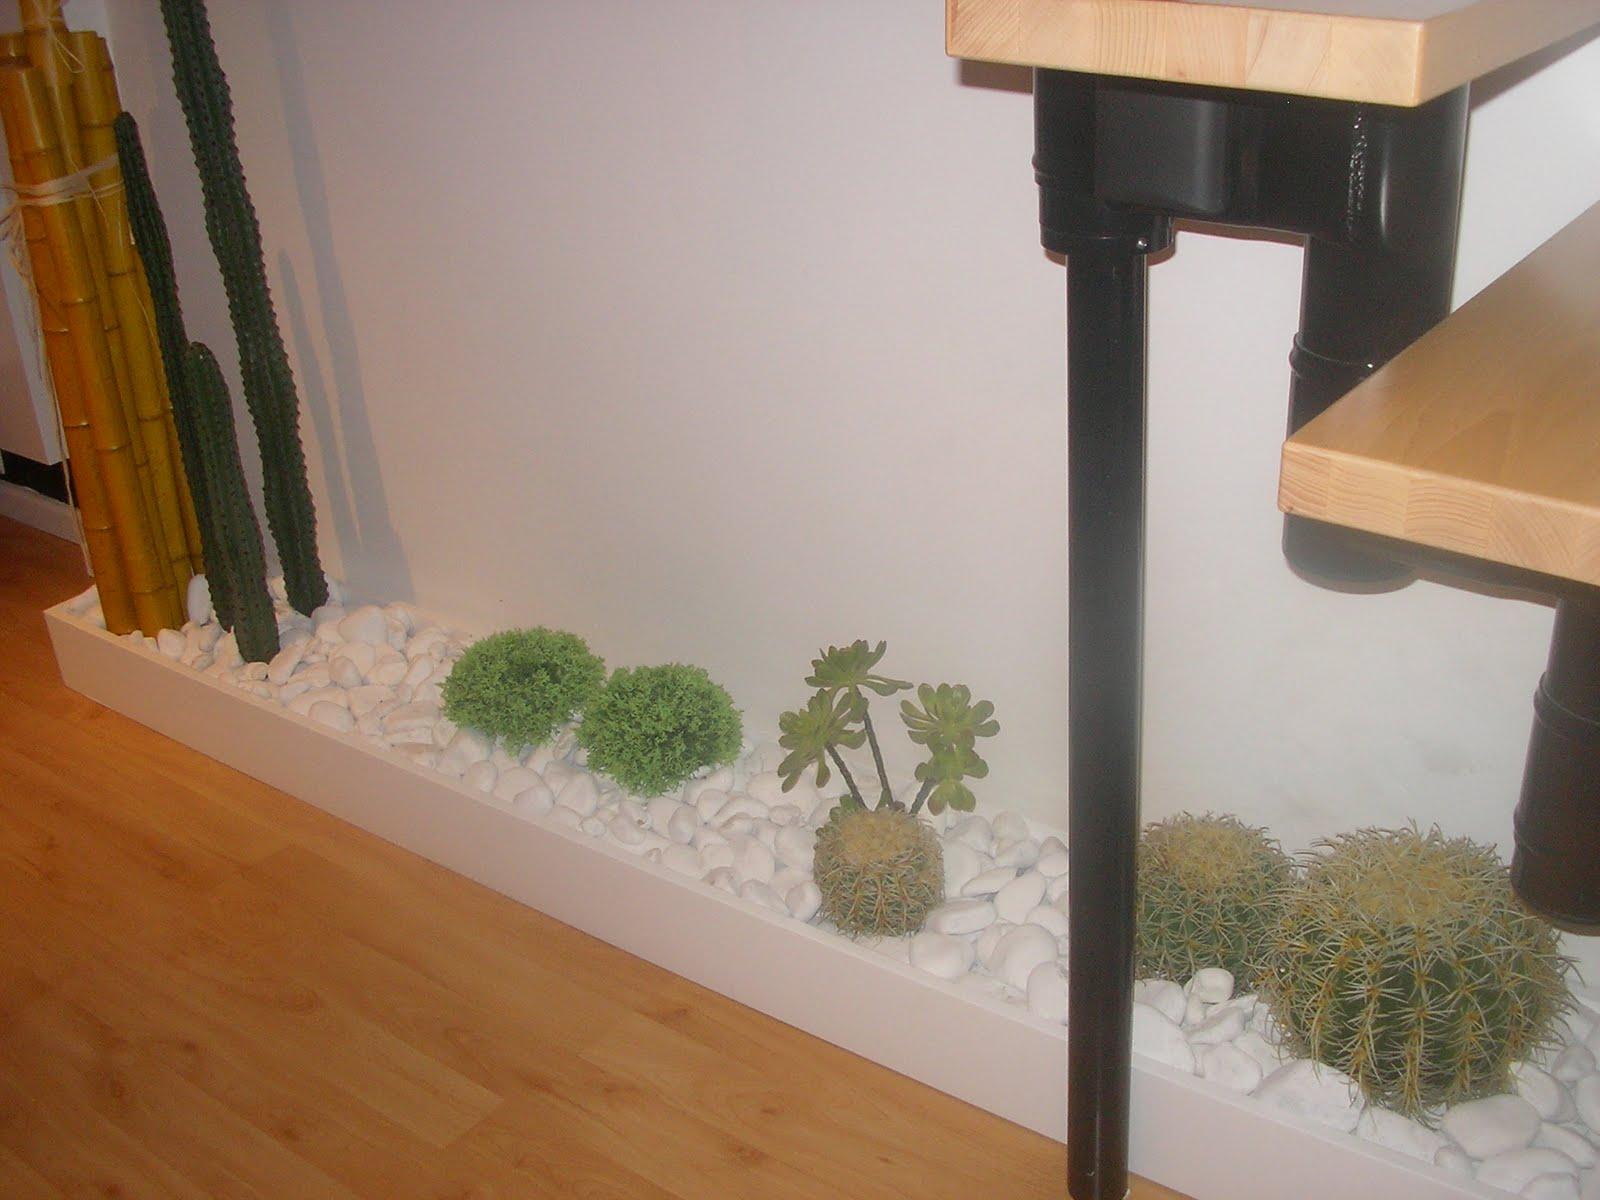 Alzado un jardin interior for Diseno jardin interior